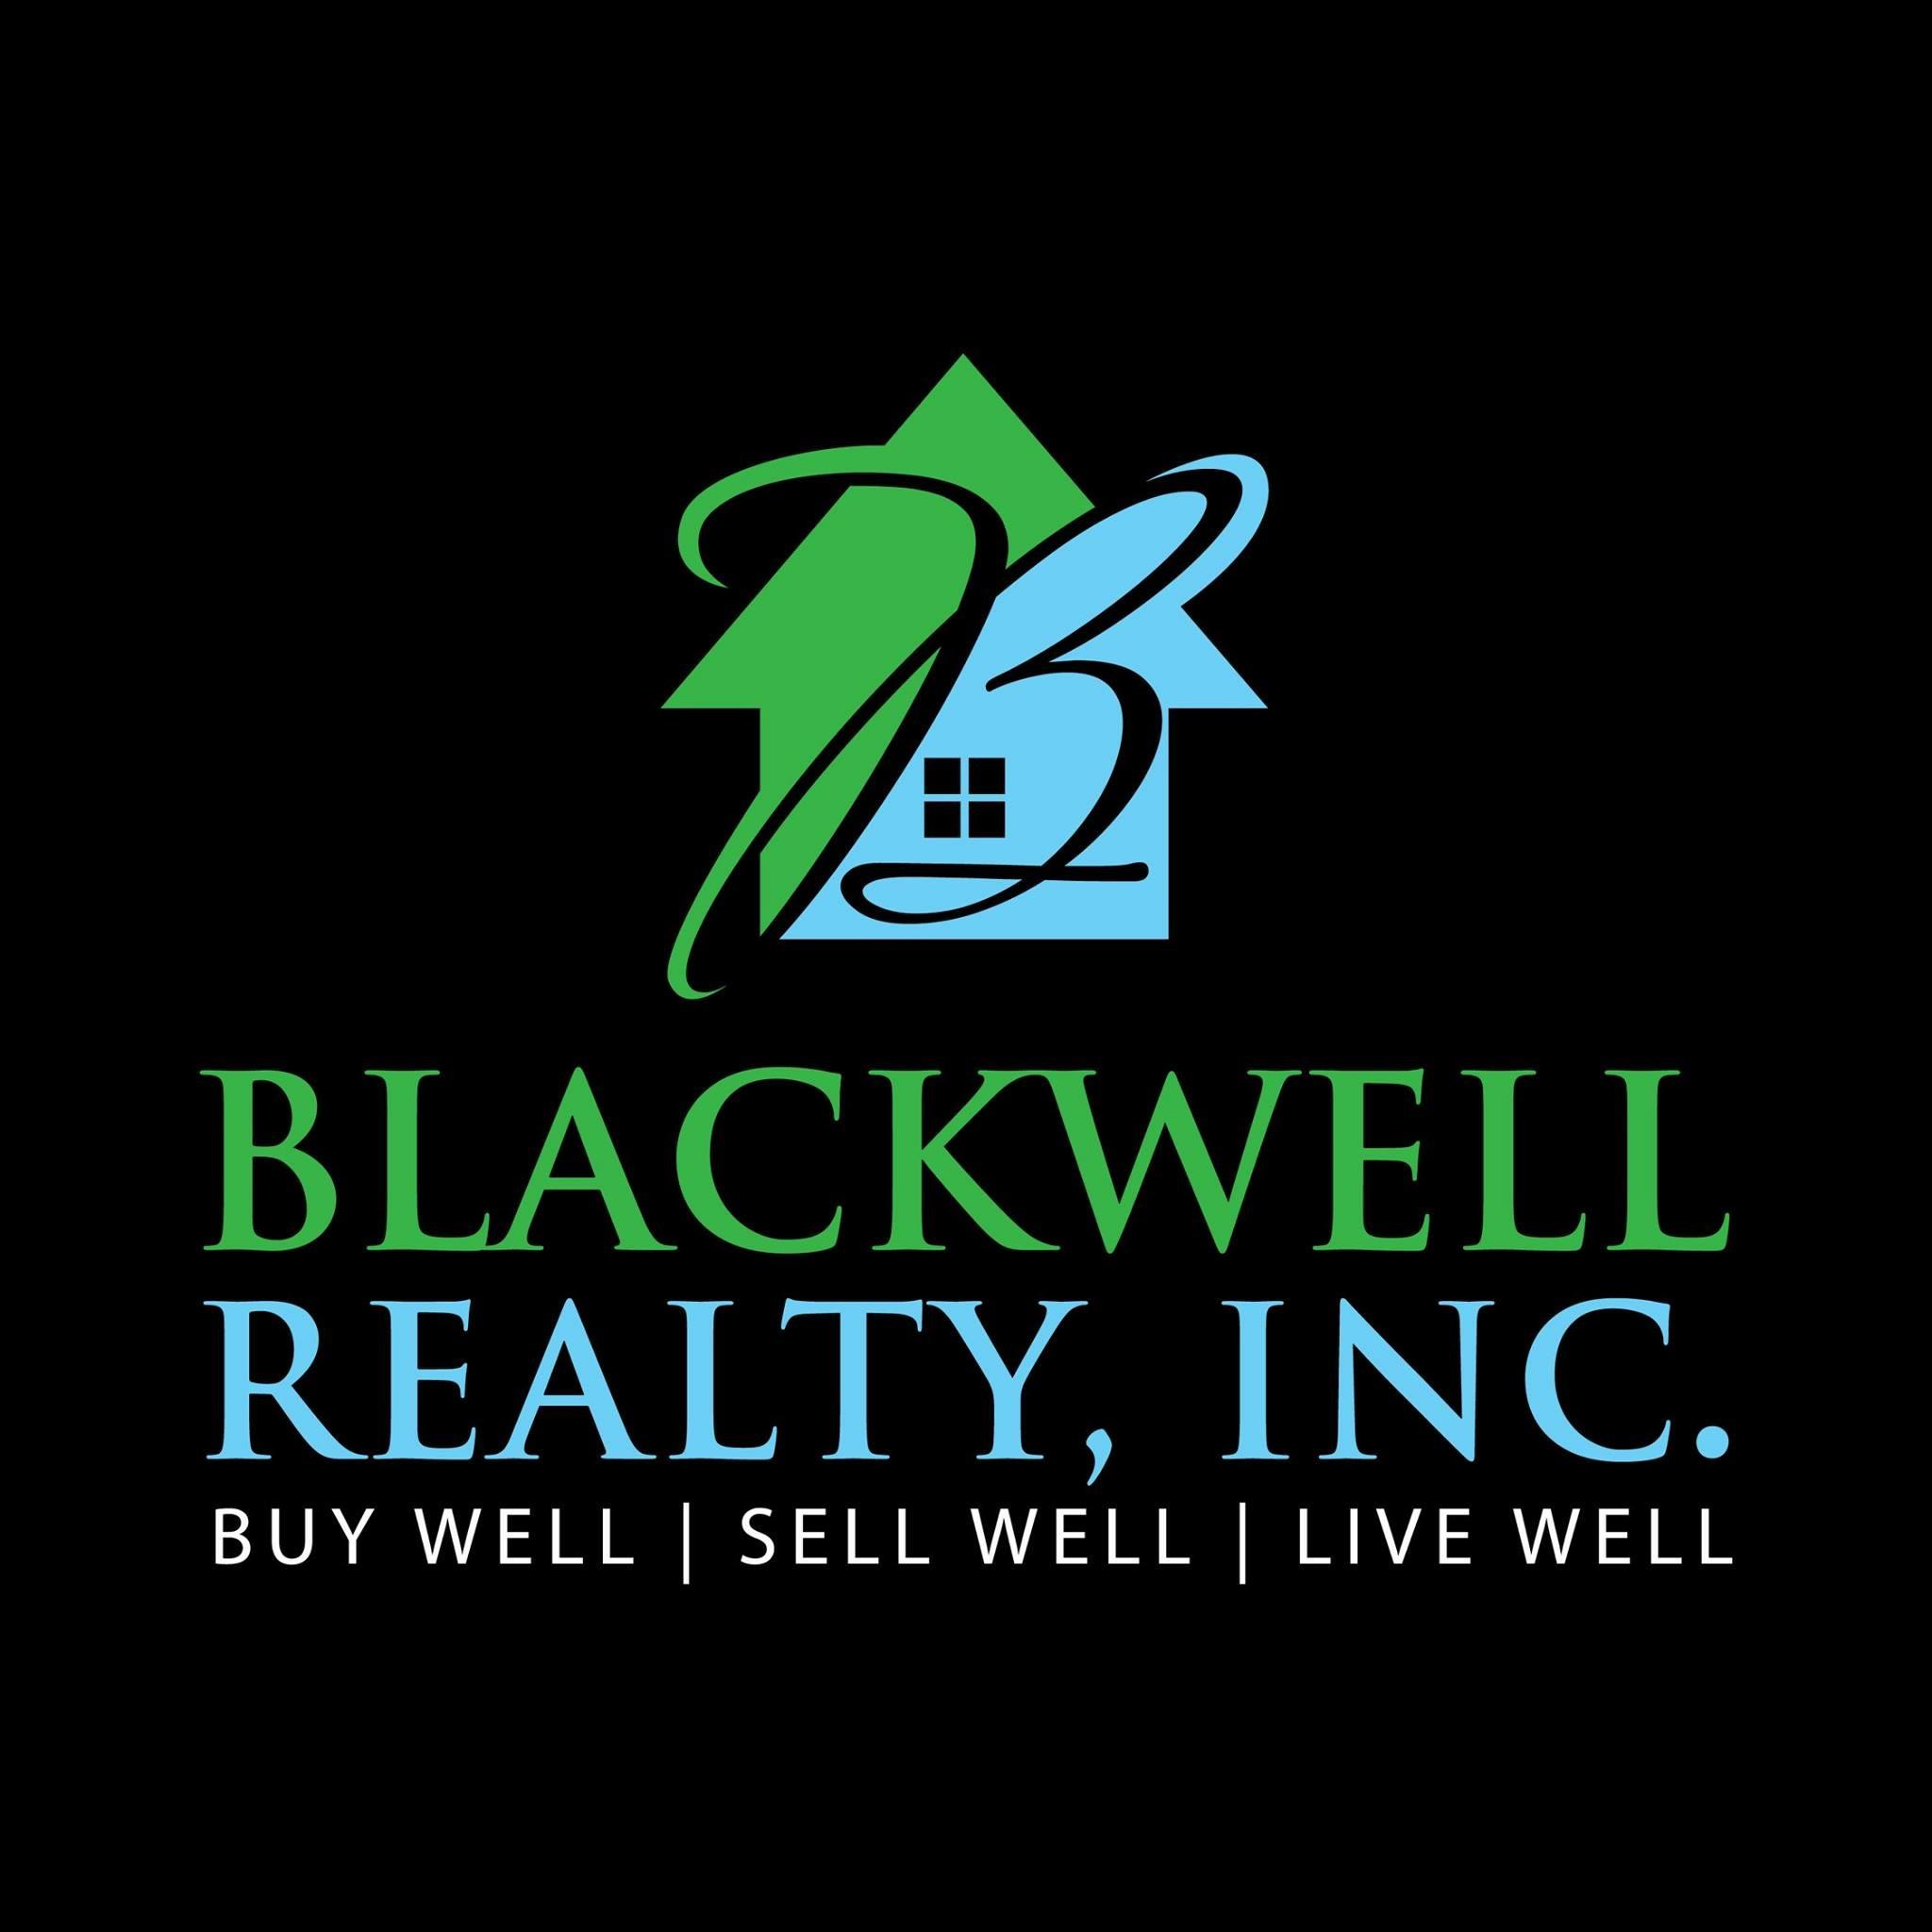 Blackwell Realty, Inc.